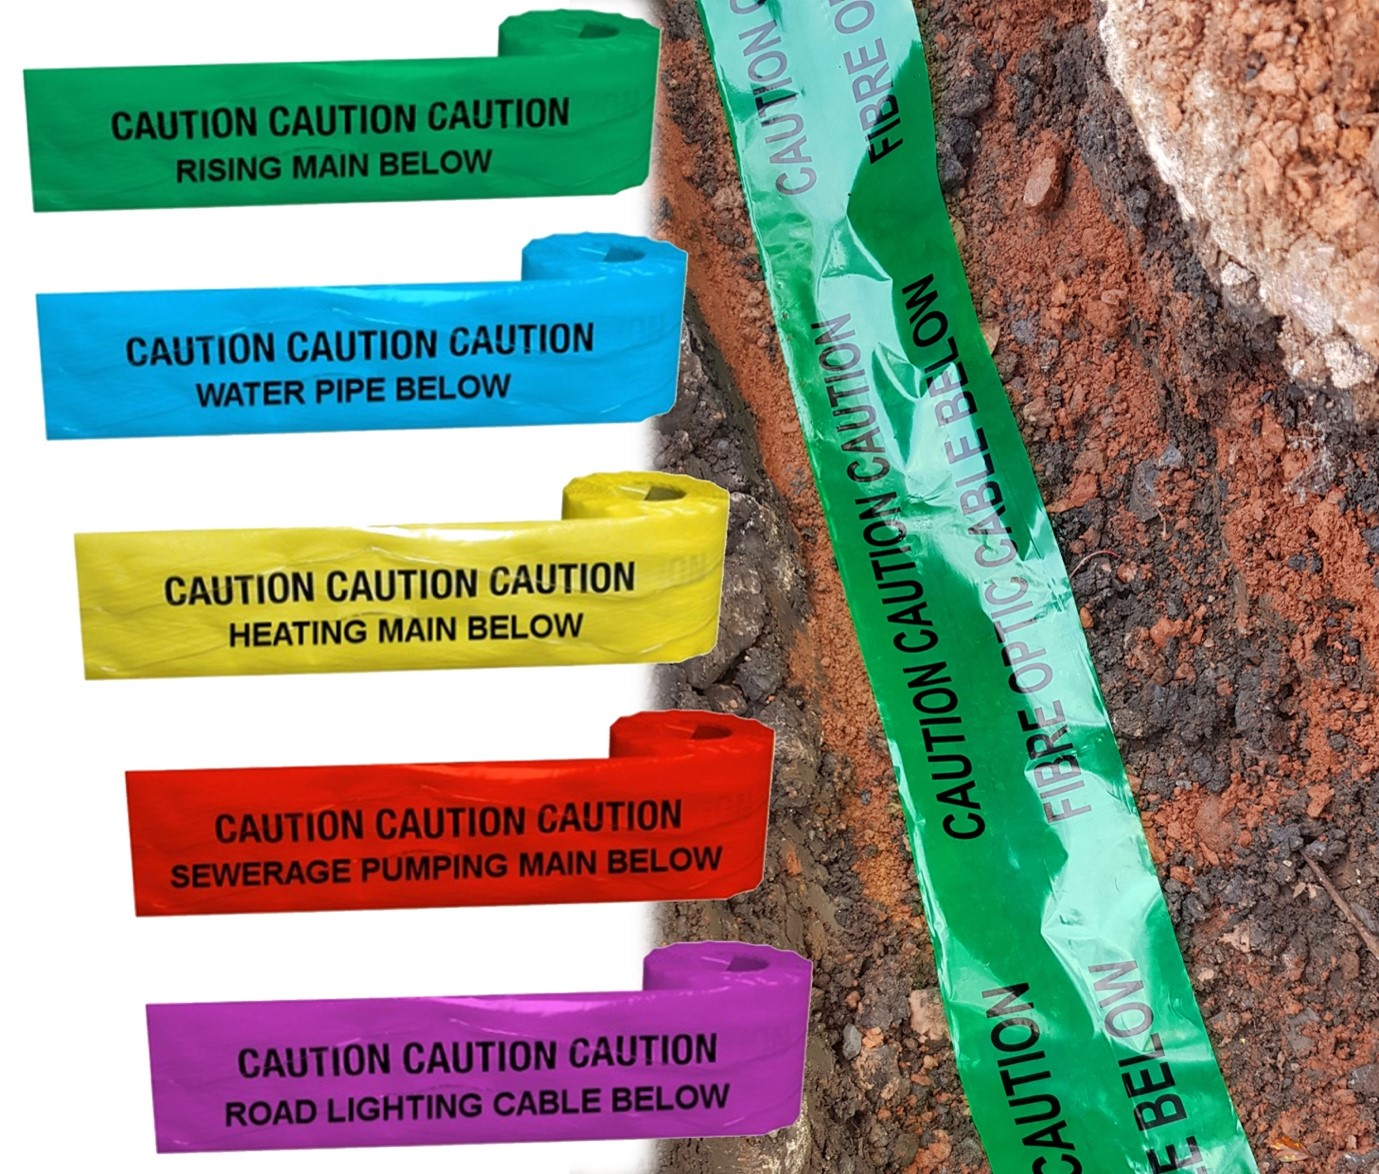 image of detectable warning tape underground